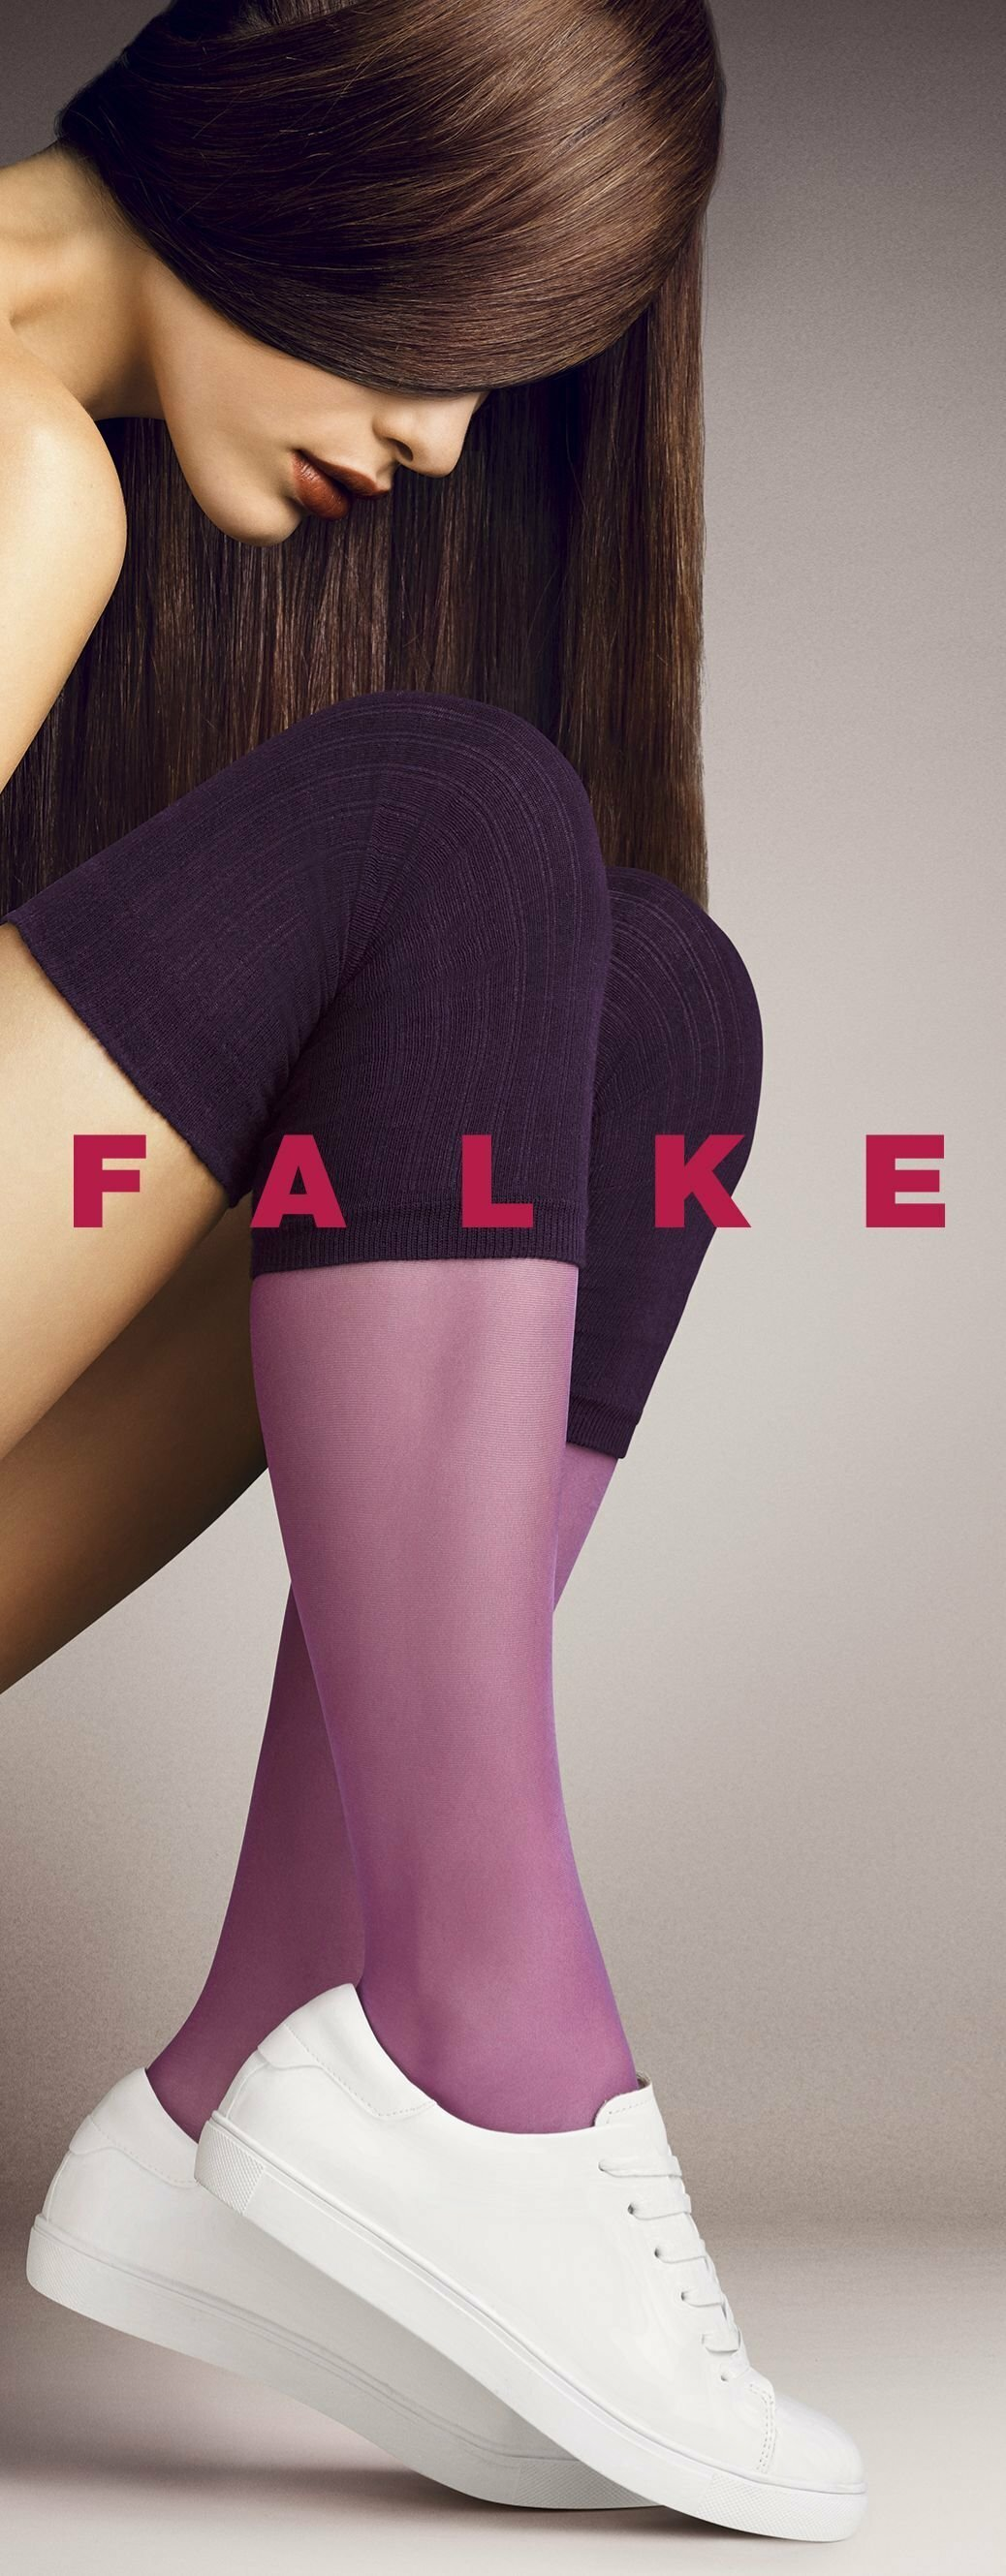 FALKE silk smooth 15 DEN ladies knee socks PLATINUM